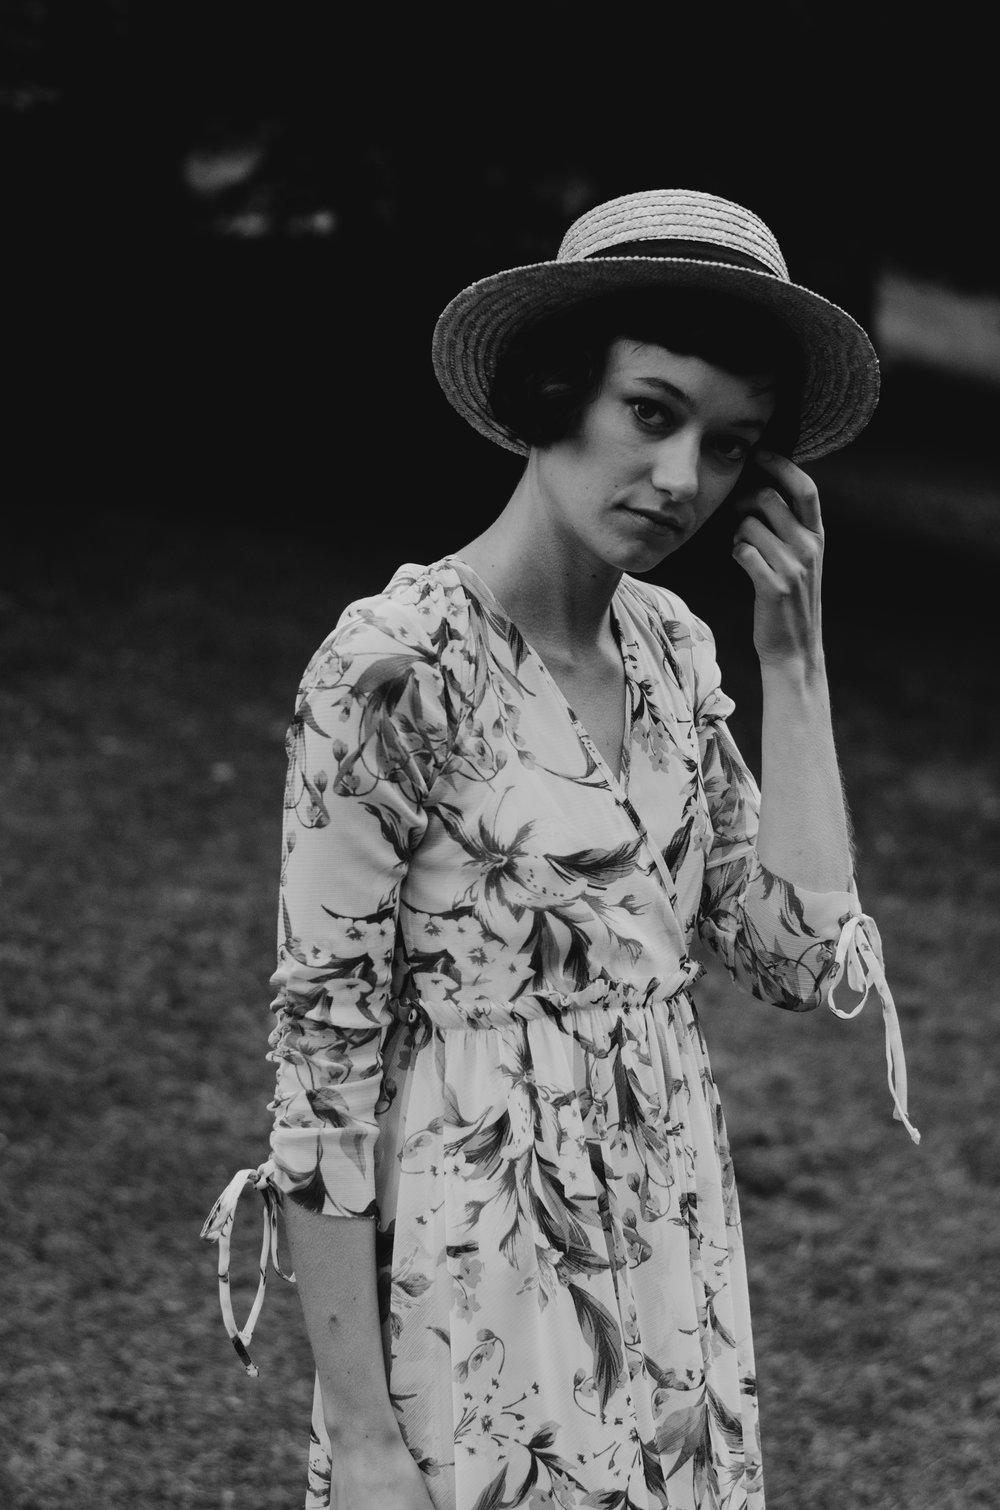 Ellie-Portrait-Session-Aiste-Saulyte-Photography-11-8-17-201.jpg